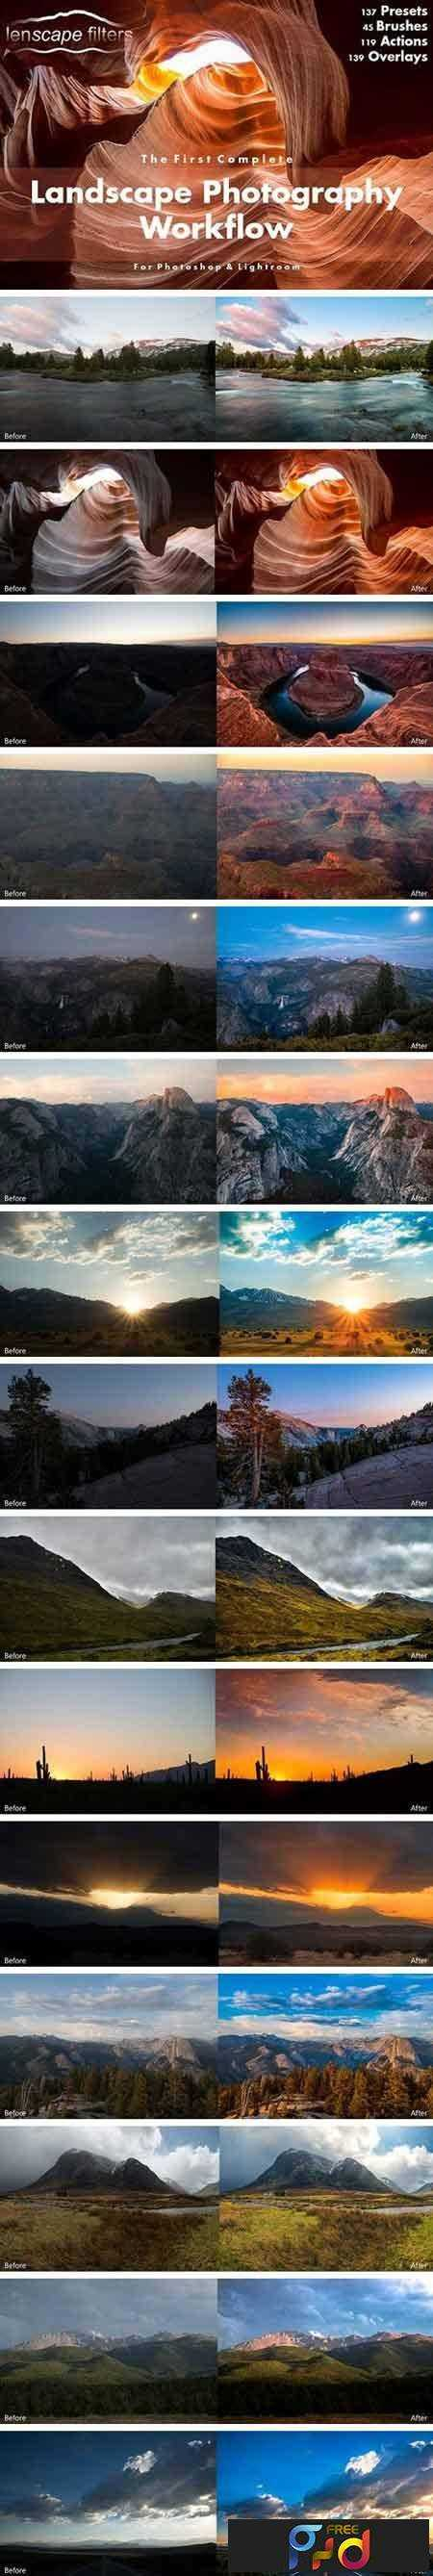 FreePsdVn.com_1705162_PHOTOSHOP_landscape_photography_workflow_1759279